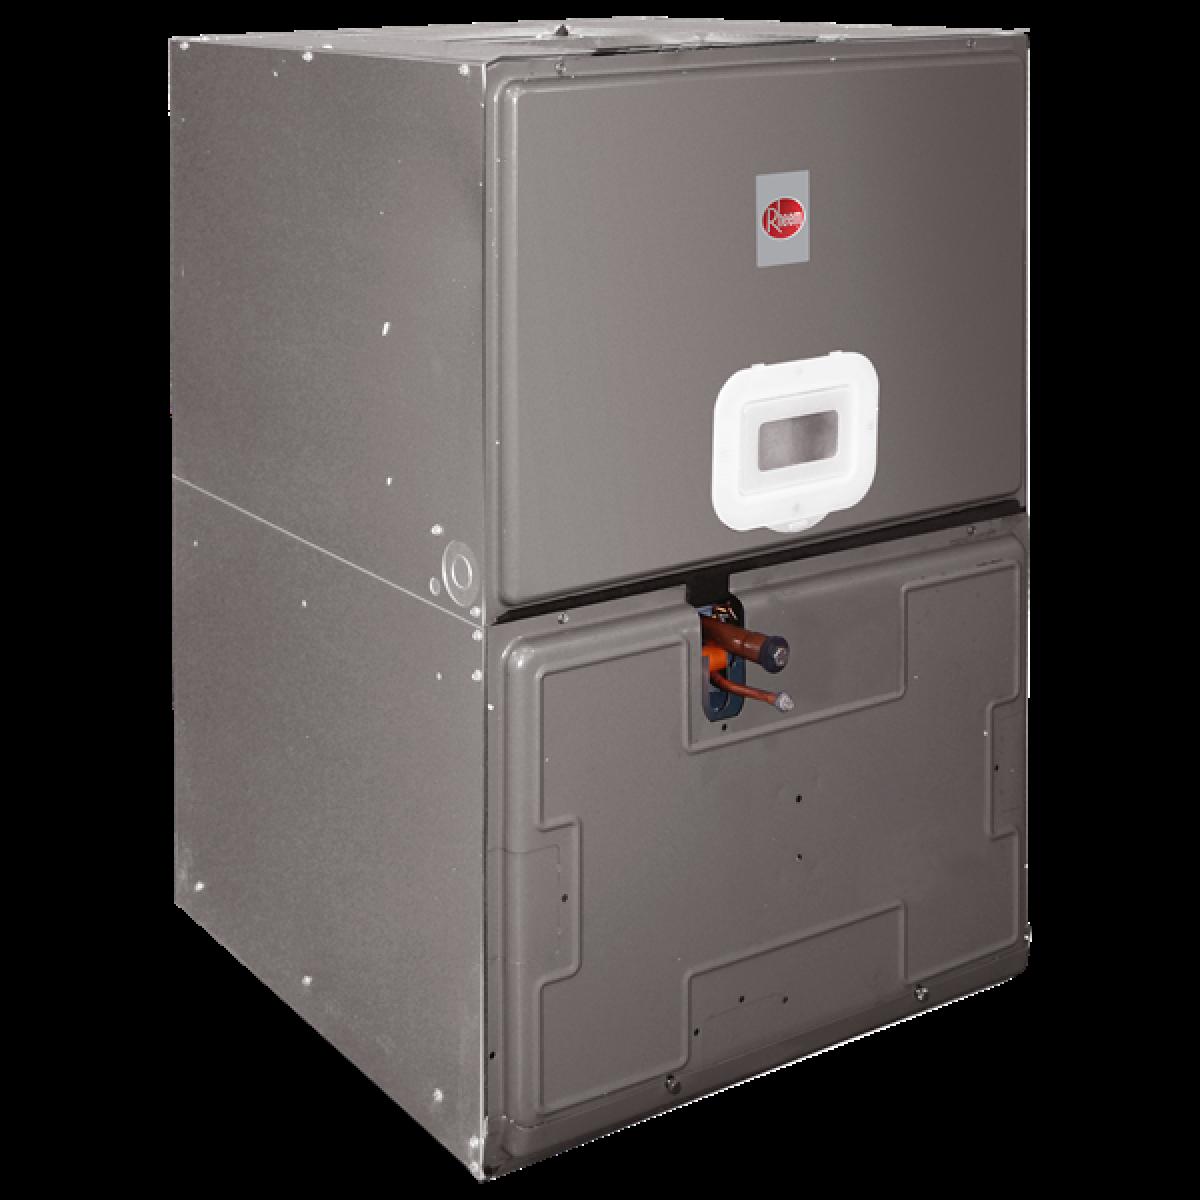 Rheem 3 5 Ton 14 Seer Electric Heat Split System With 10